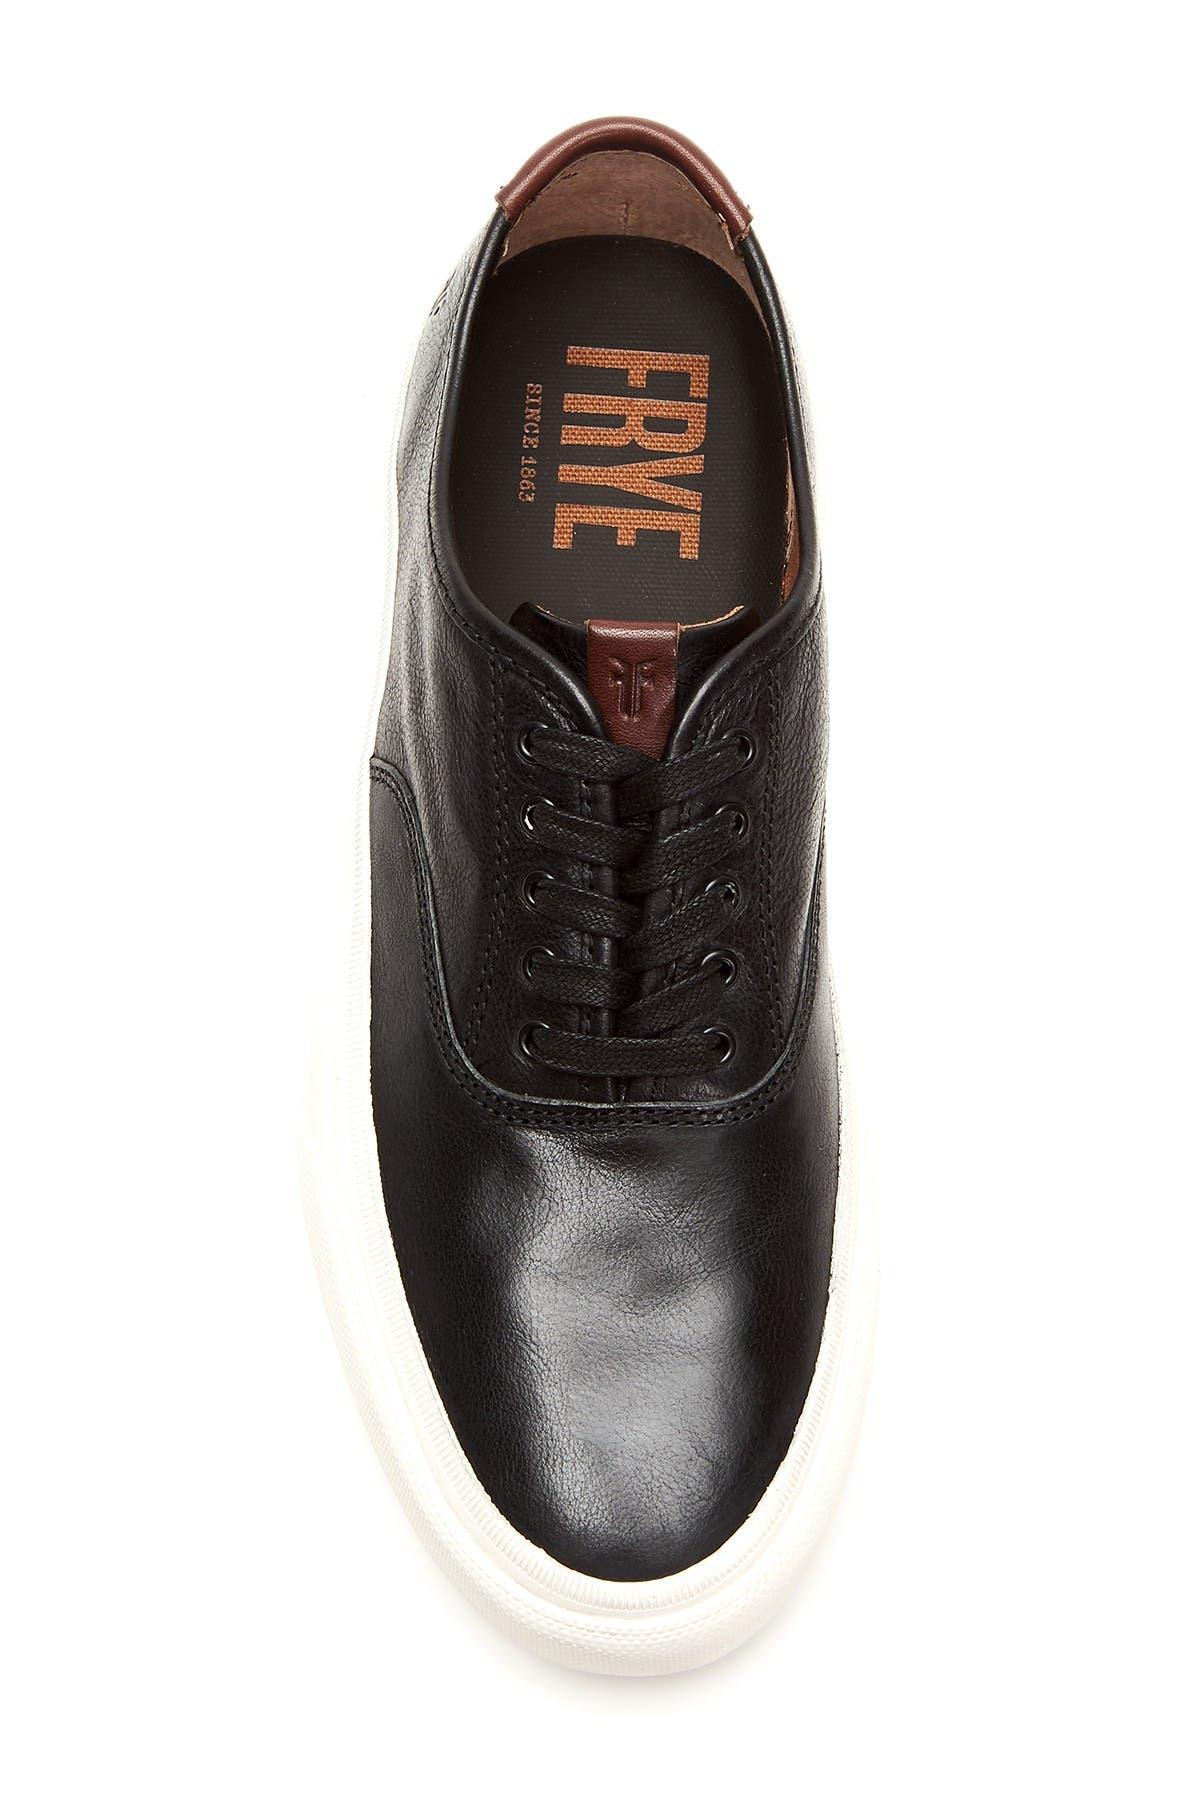 Frye   Ludlow Leather Bal Oxford